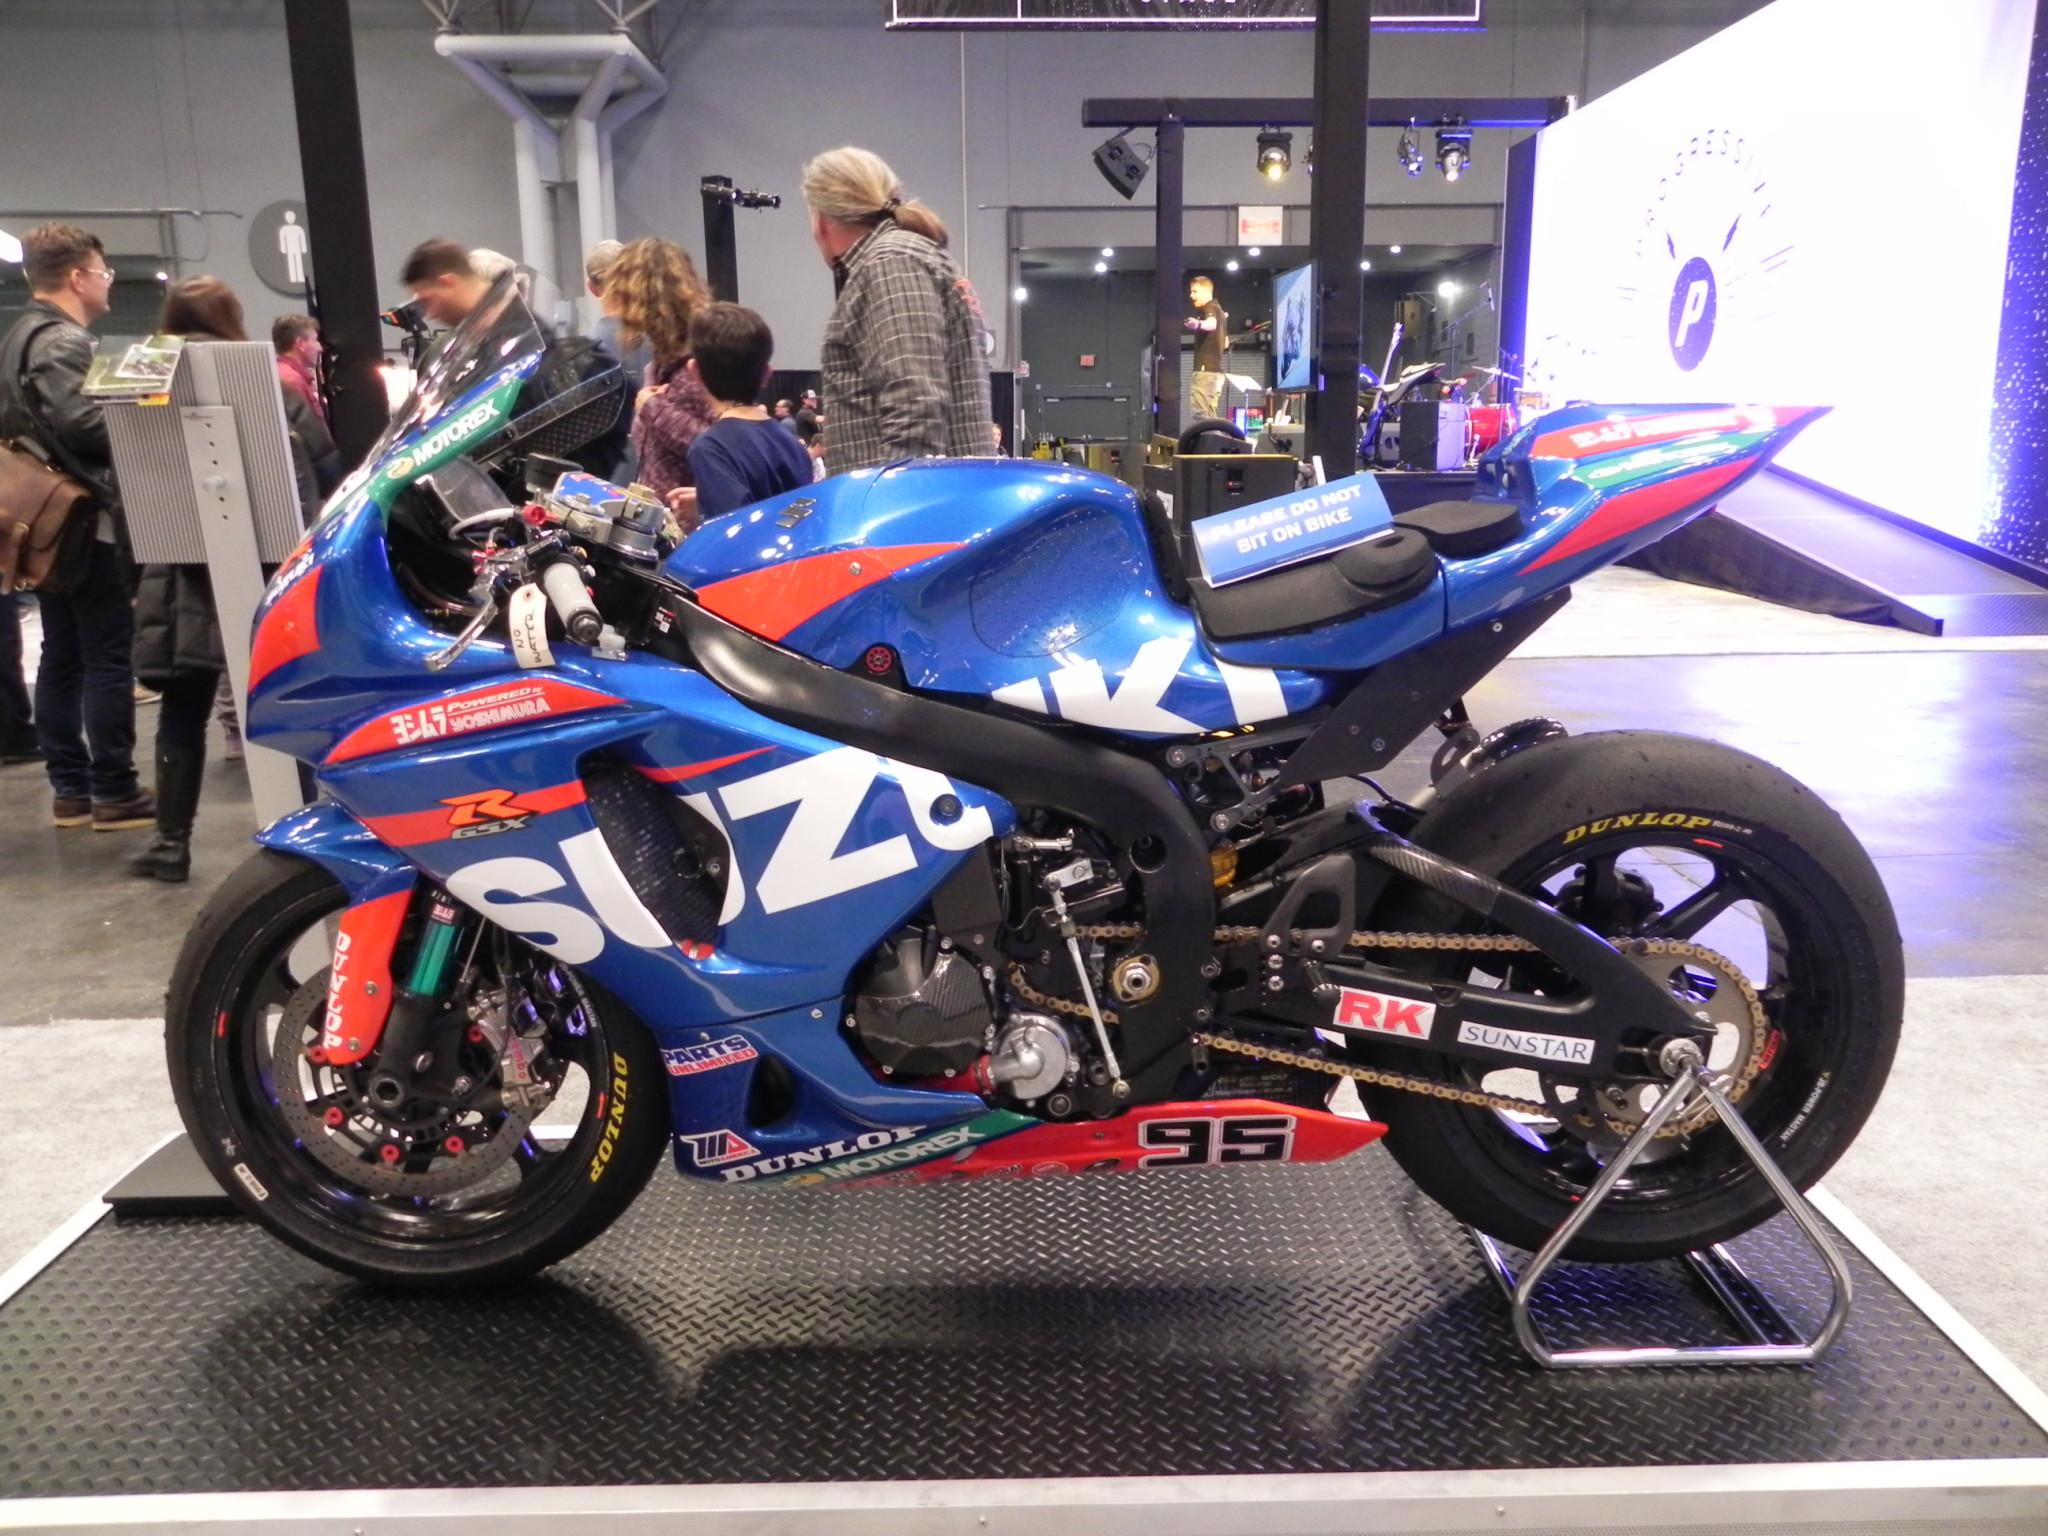 suzuki-race-bike | Motorcycle Product Reviews News Events Tech